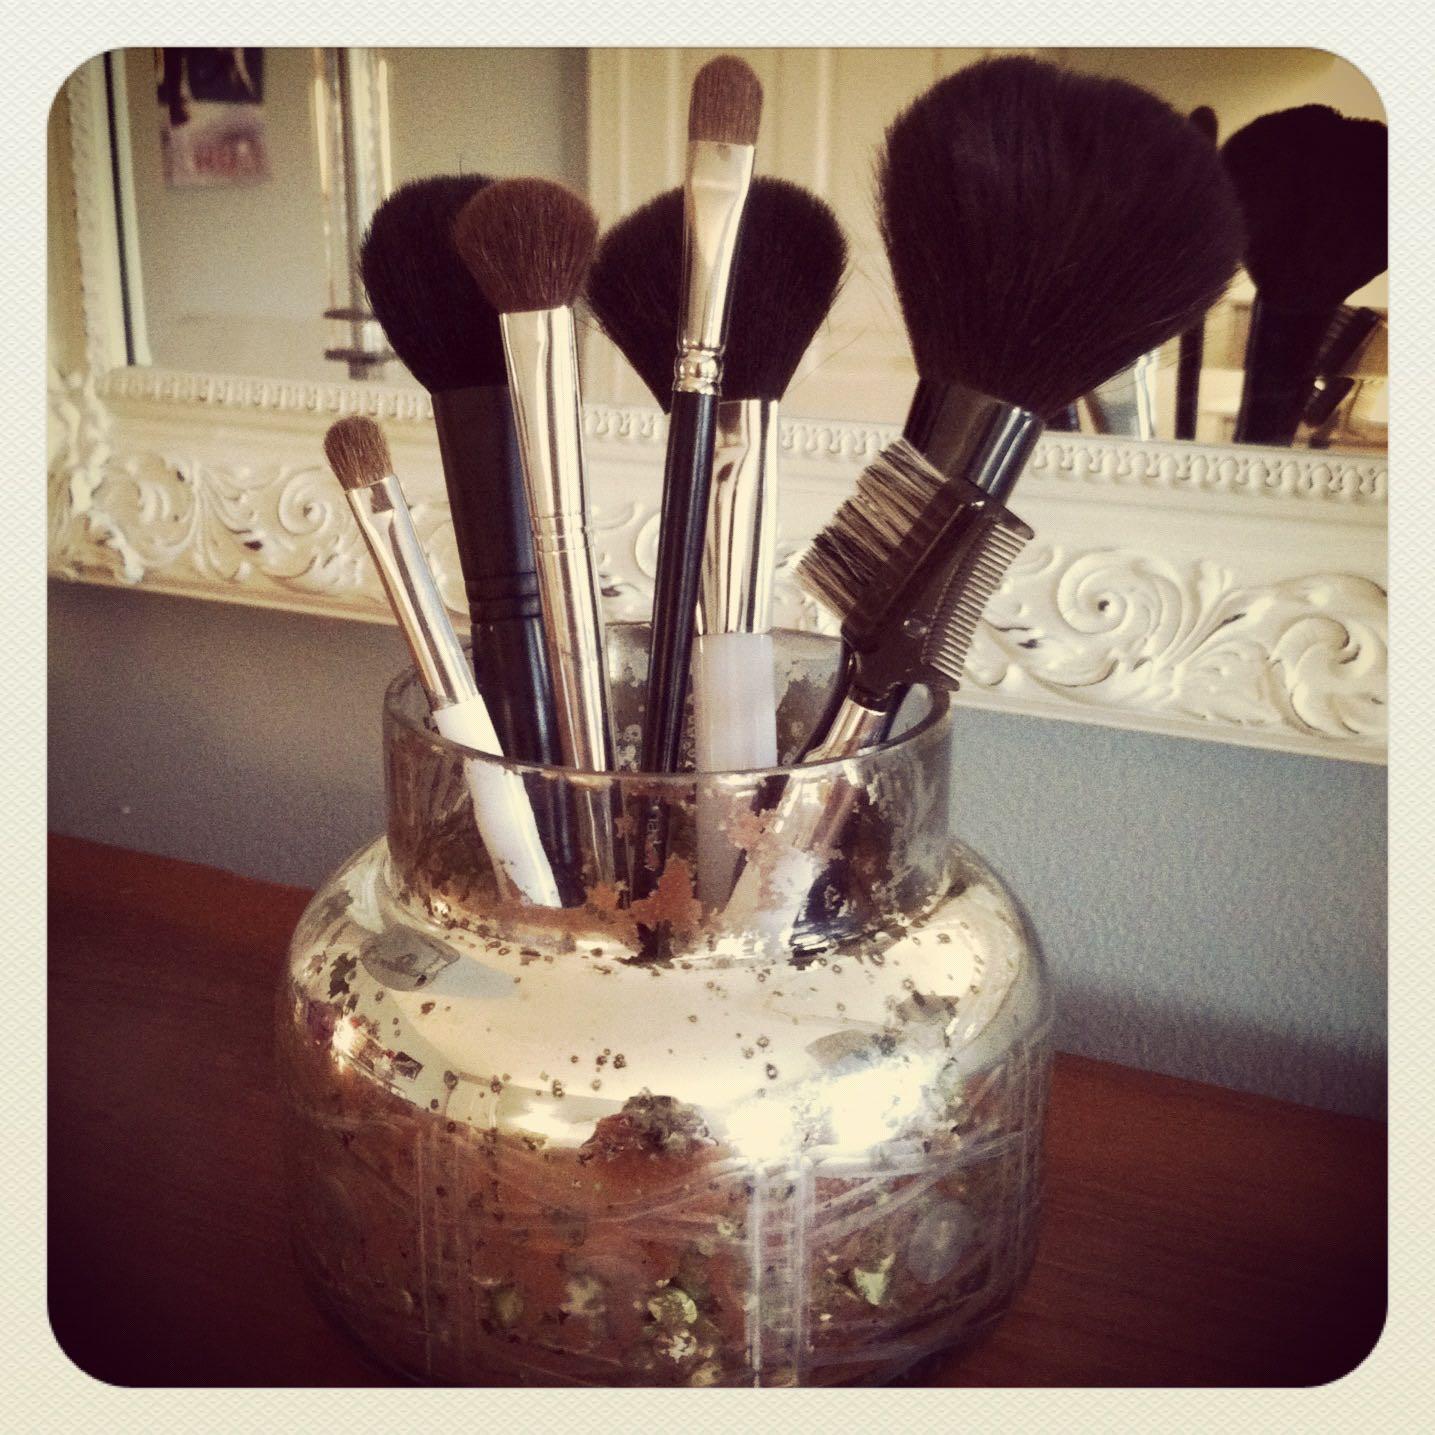 emmm.makeup